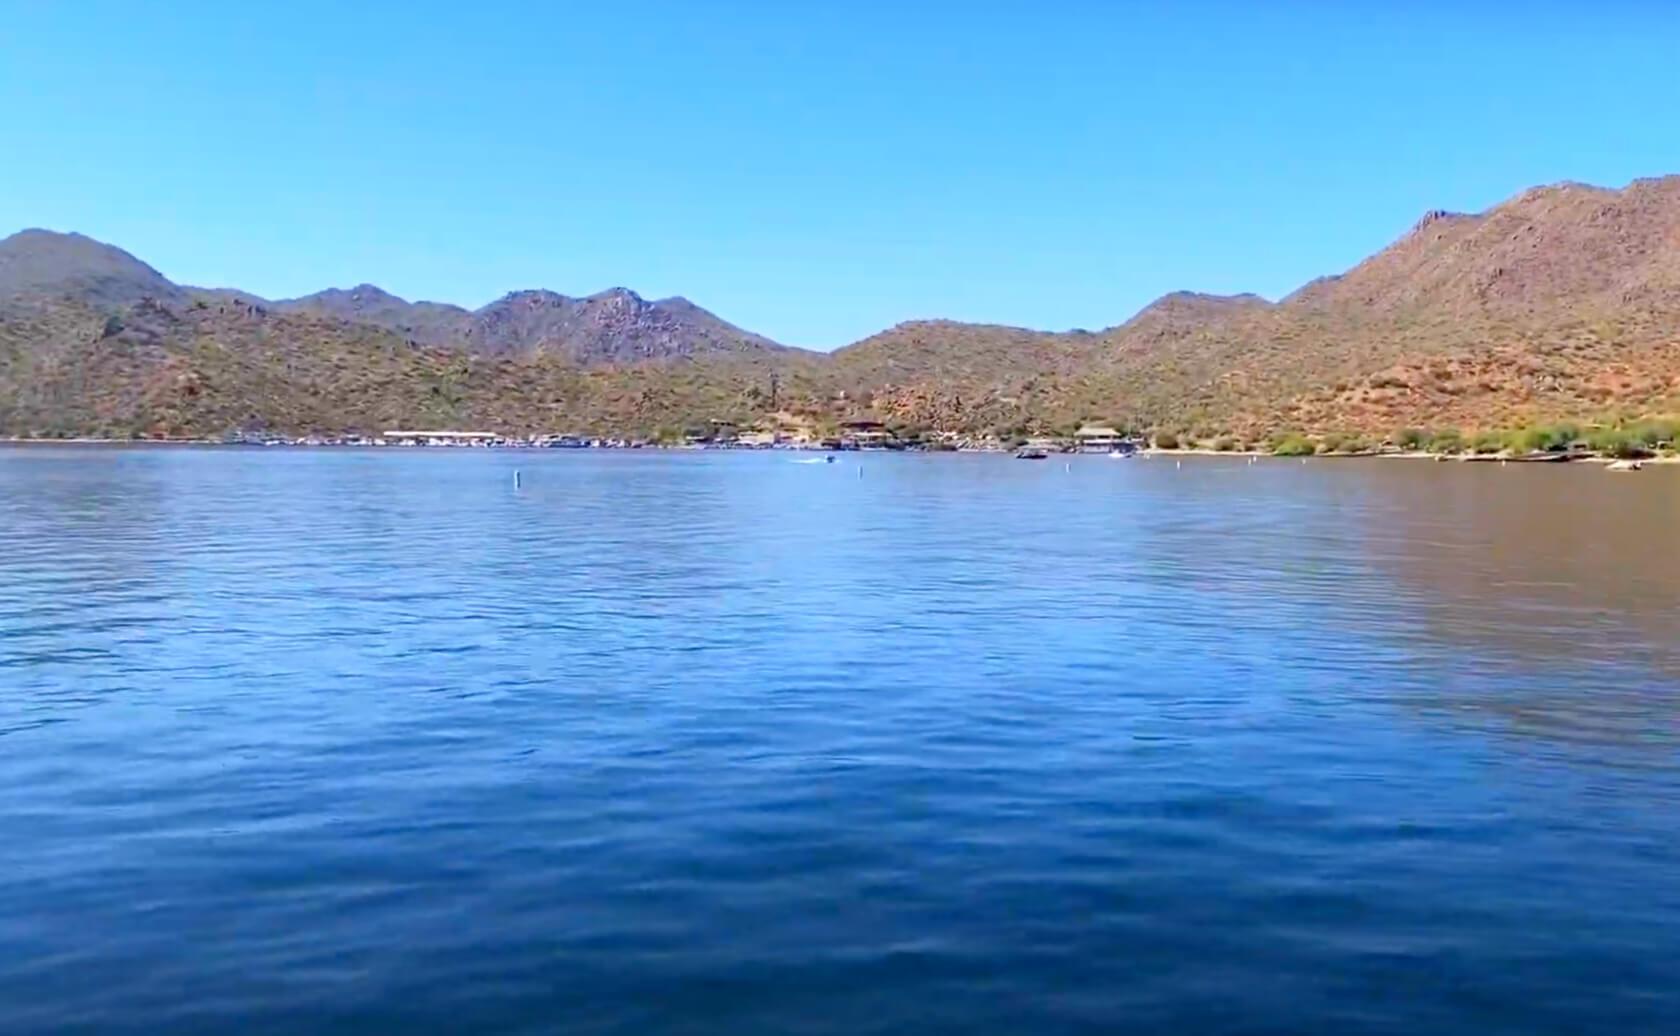 saguaro-lake-fishing-guide-report-az-01